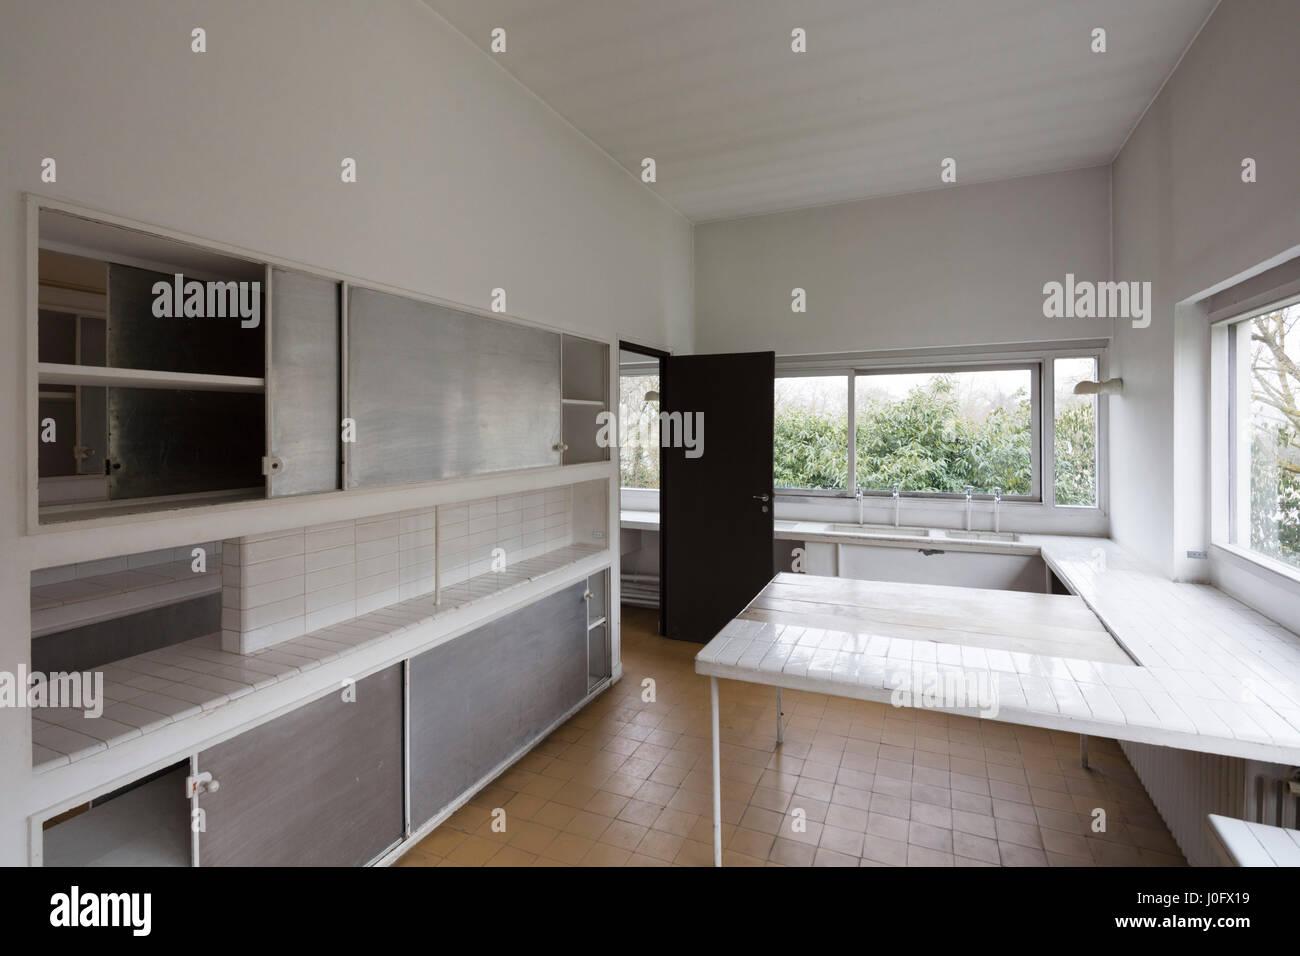 kitchen, Villa Savoye at Poissy, France, modernist architectural ...